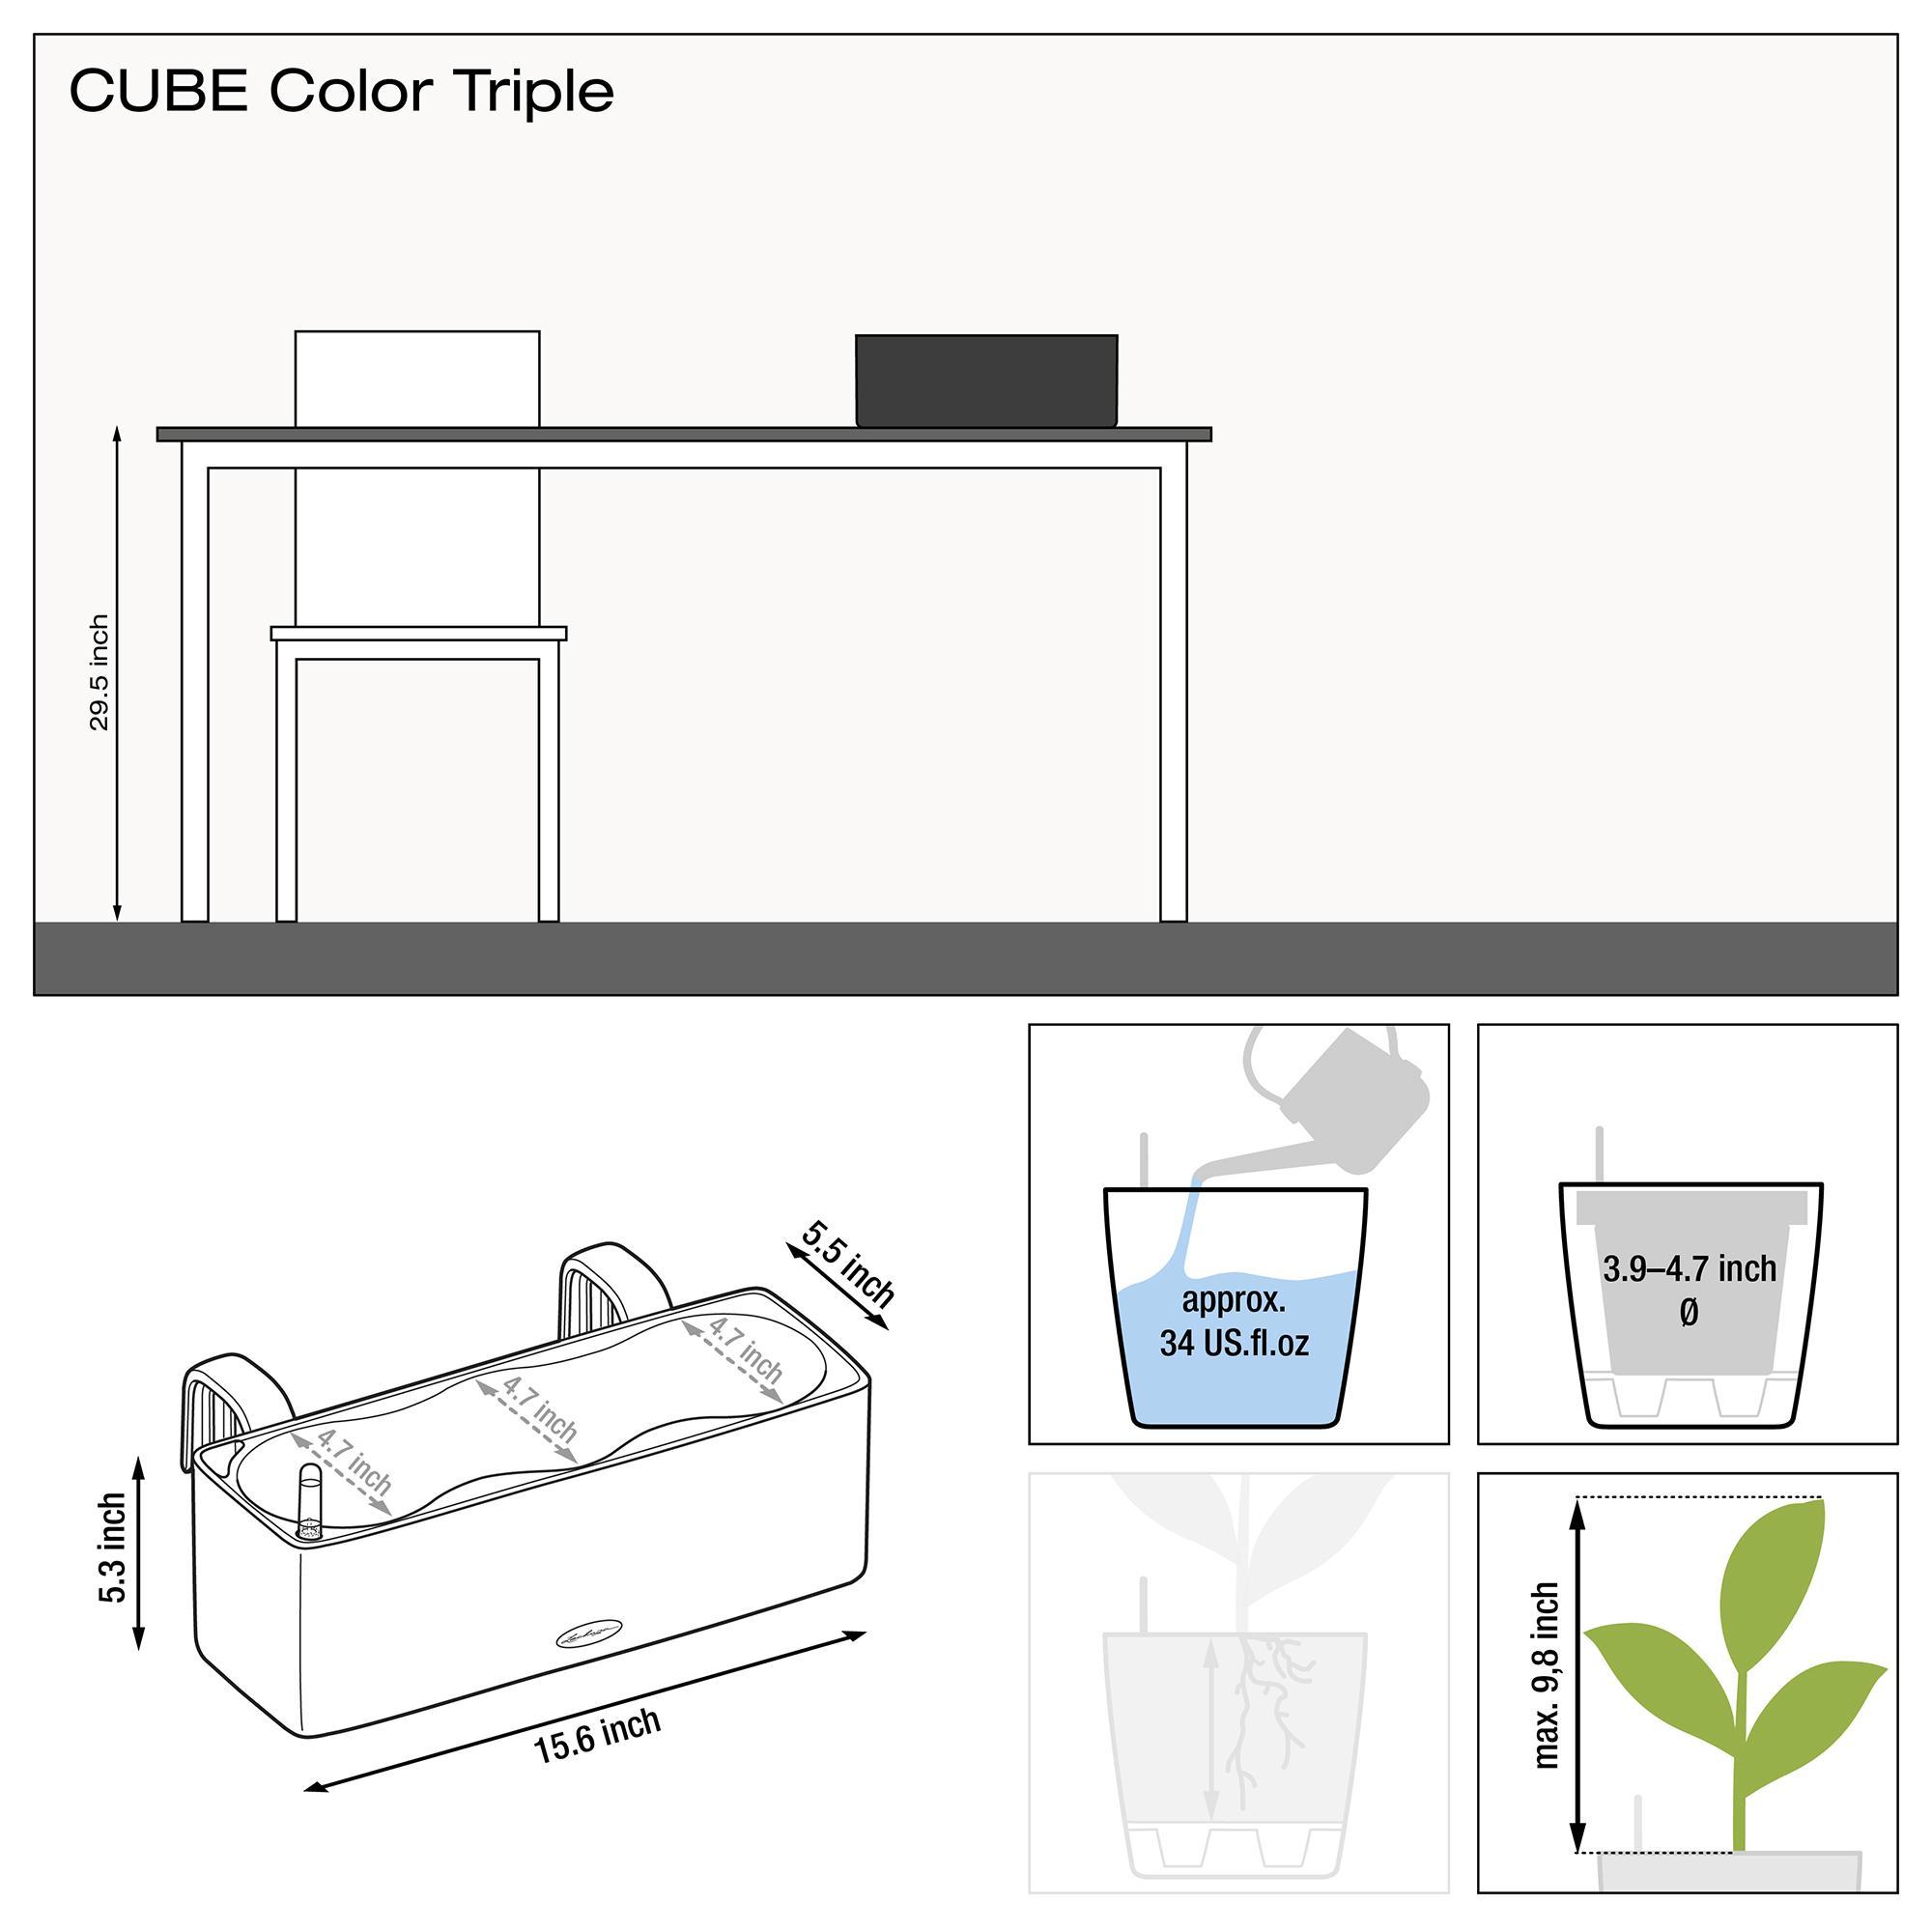 le_cube-color-triple_product_addi_nz_us